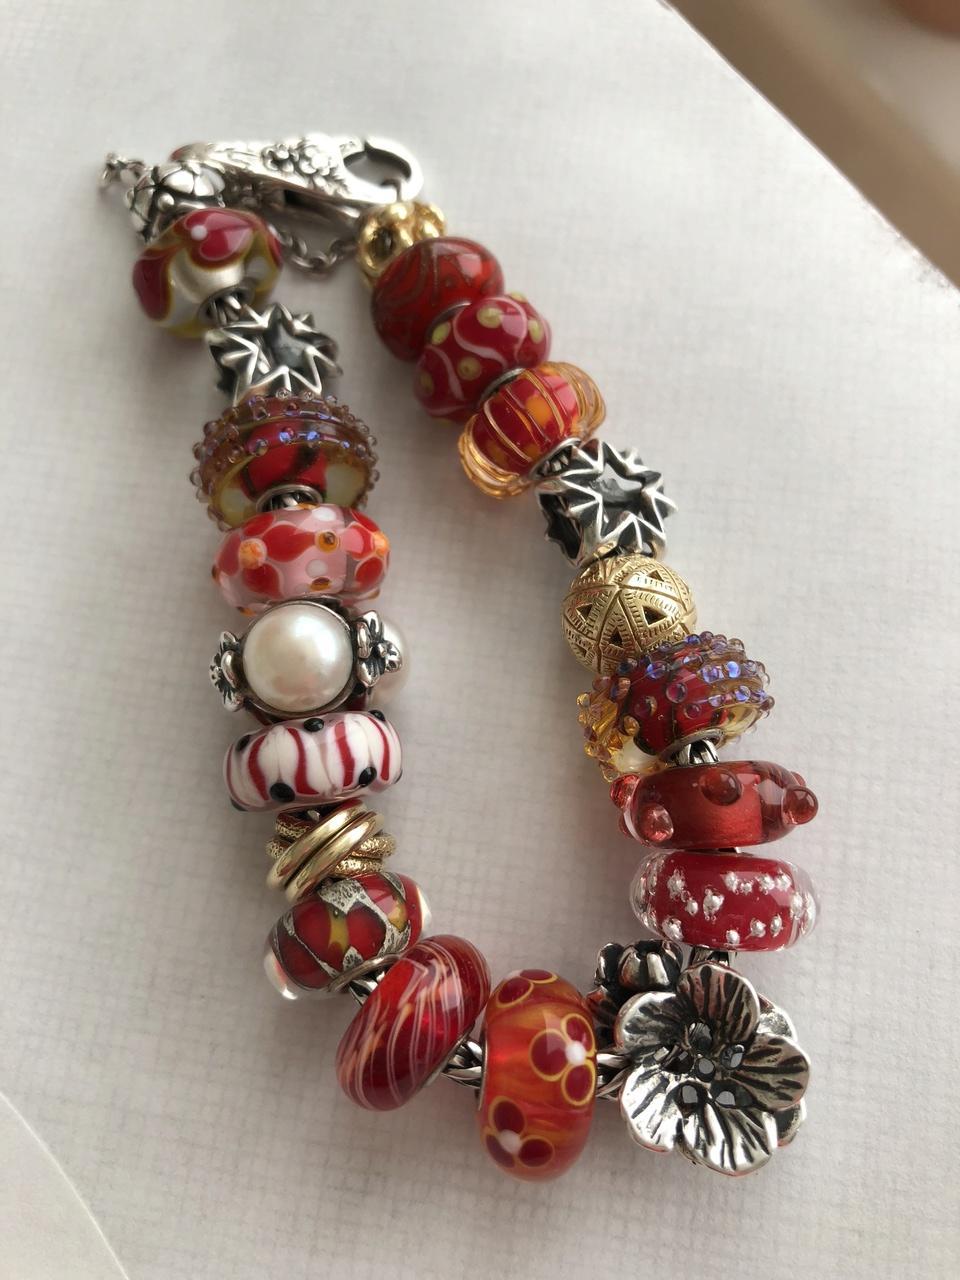 Show Your Holiday Bracelets Xmasre11